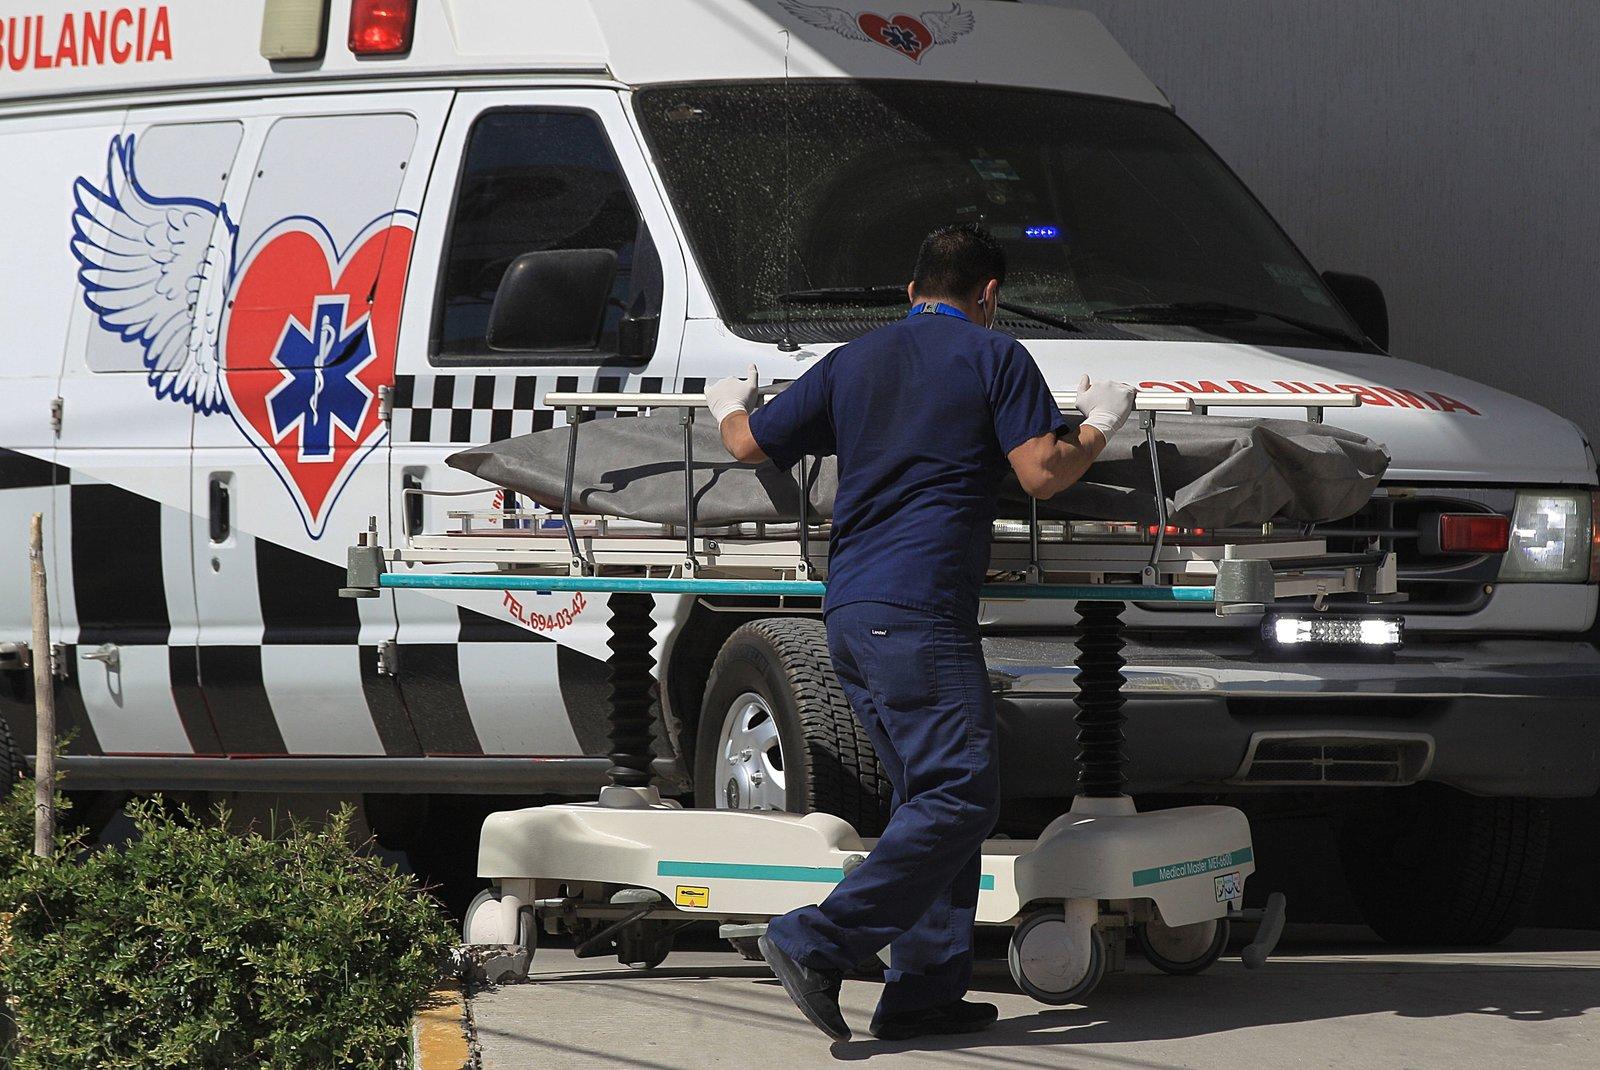 México acumula 274 mil 139 muertes por COVID-19